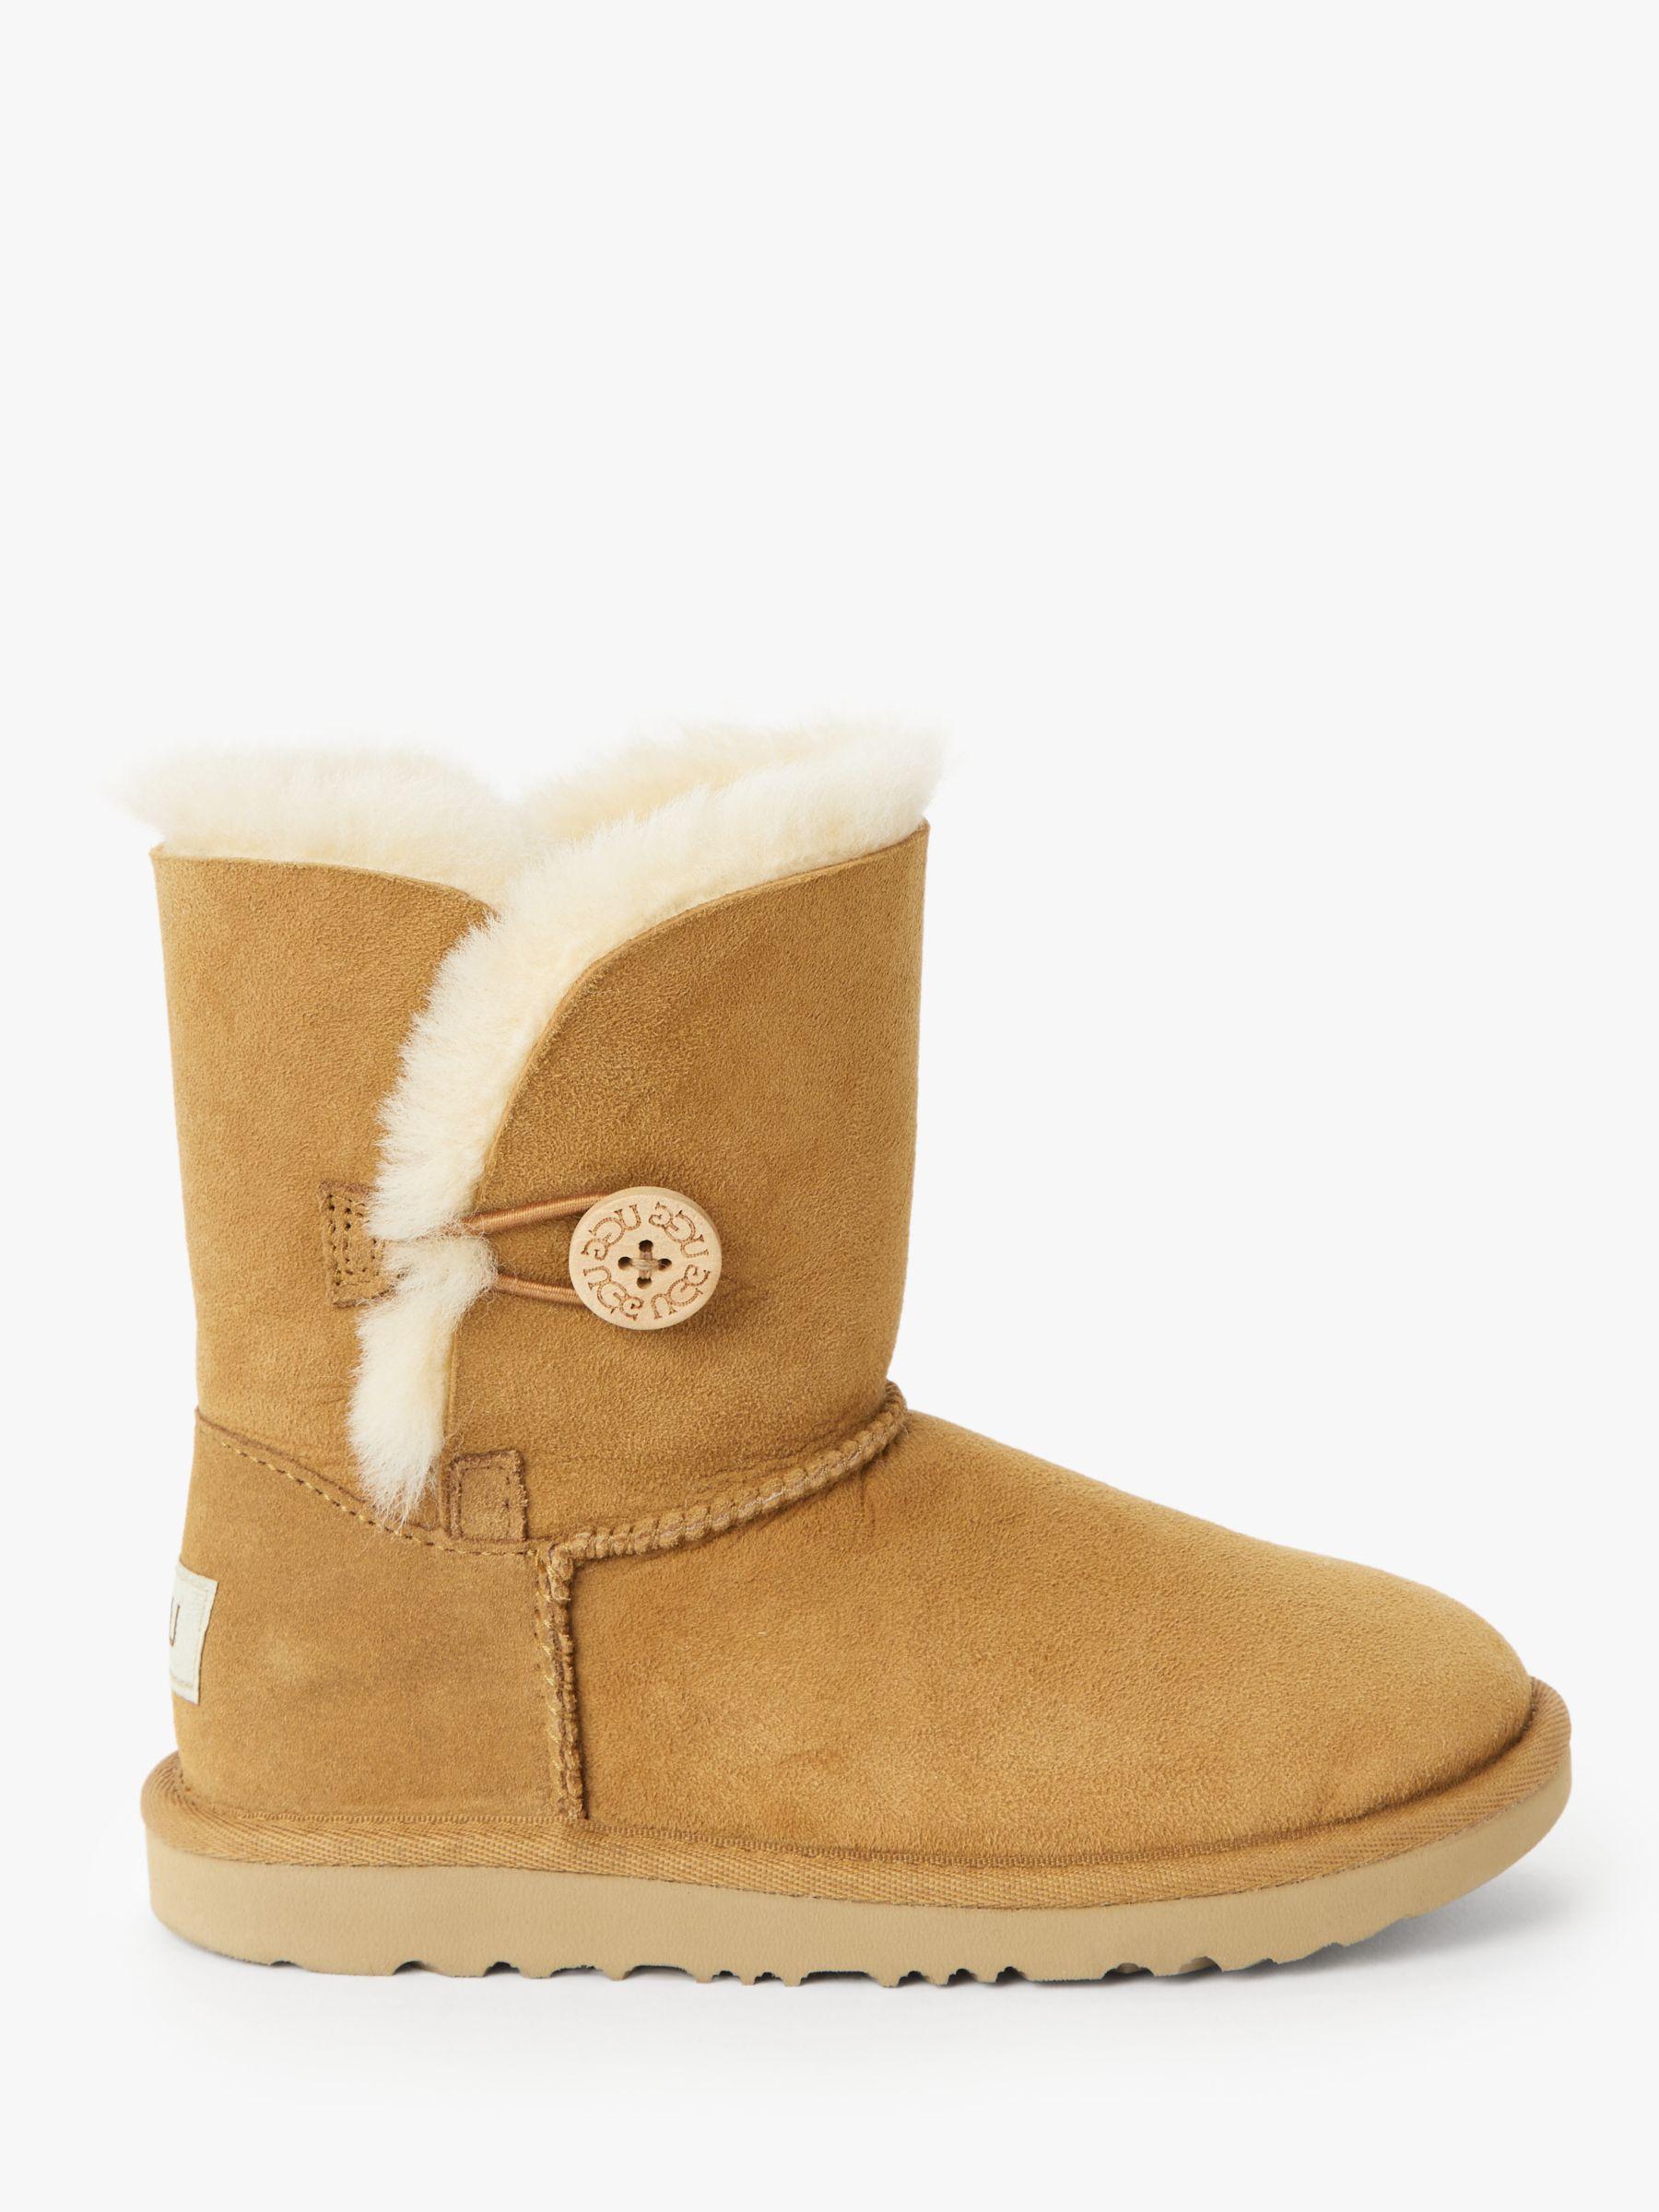 adea1e9937f UGG Children's Bailey Button II Boots, Chestnut